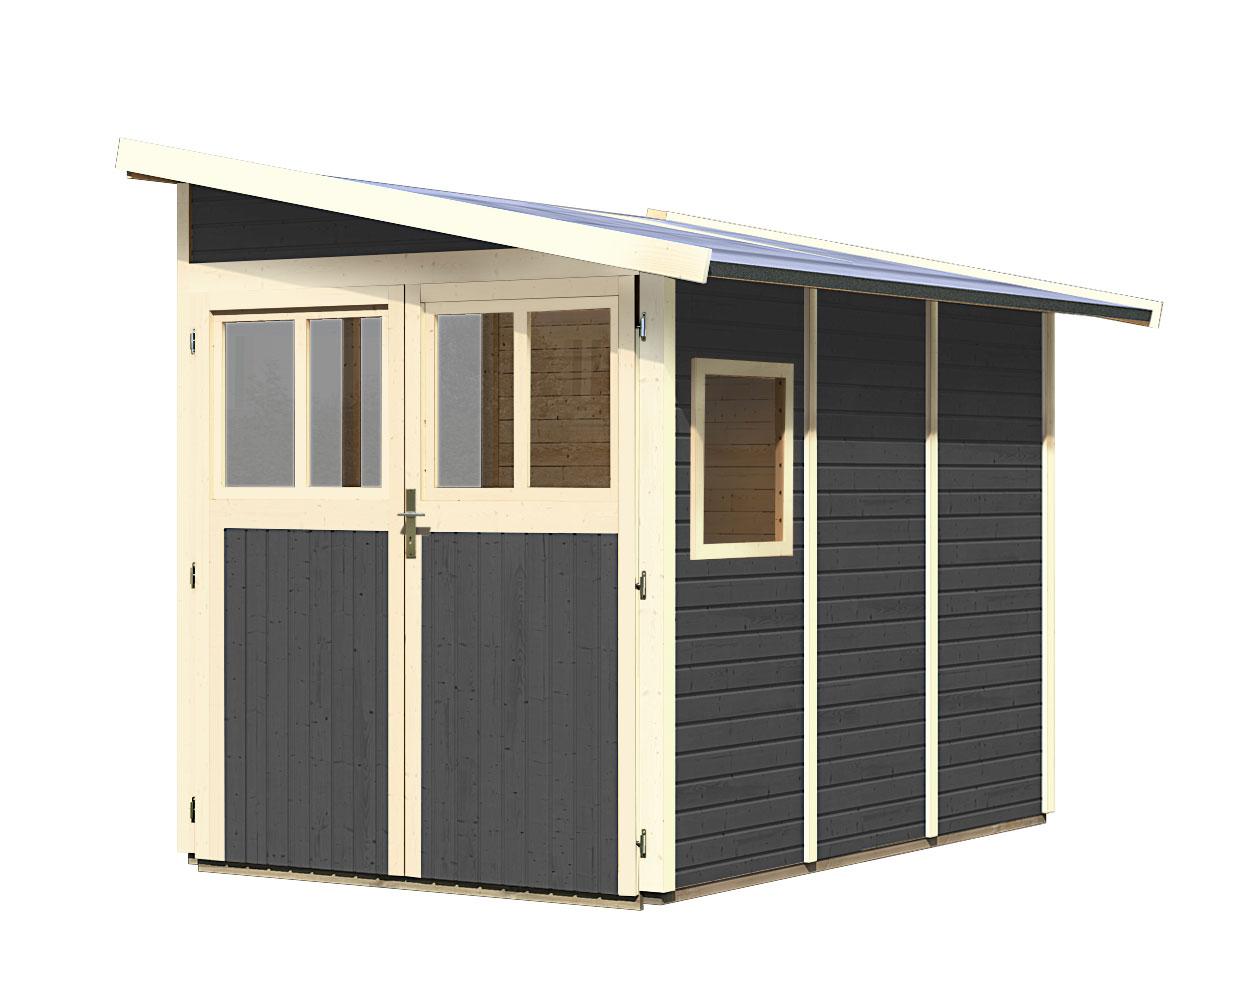 karibu ger tehaus 19 mm wandlitz 3 grau 208x320cm bei. Black Bedroom Furniture Sets. Home Design Ideas